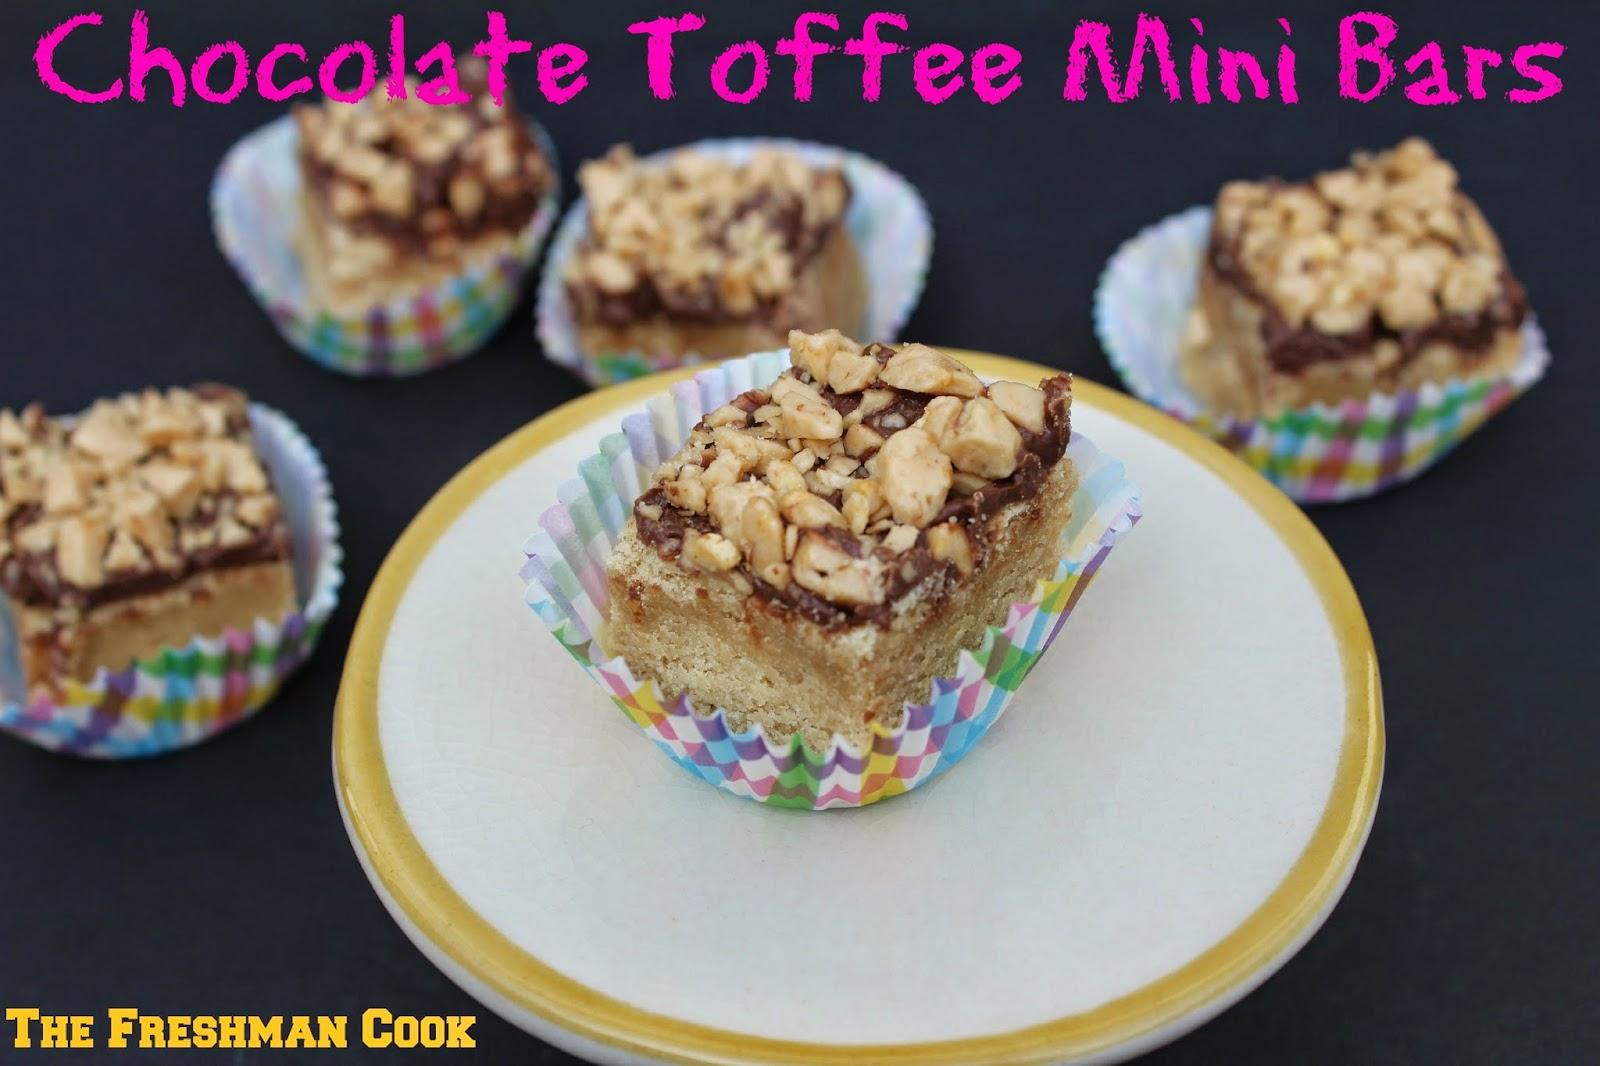 Chocolate Toffee Mini Bars